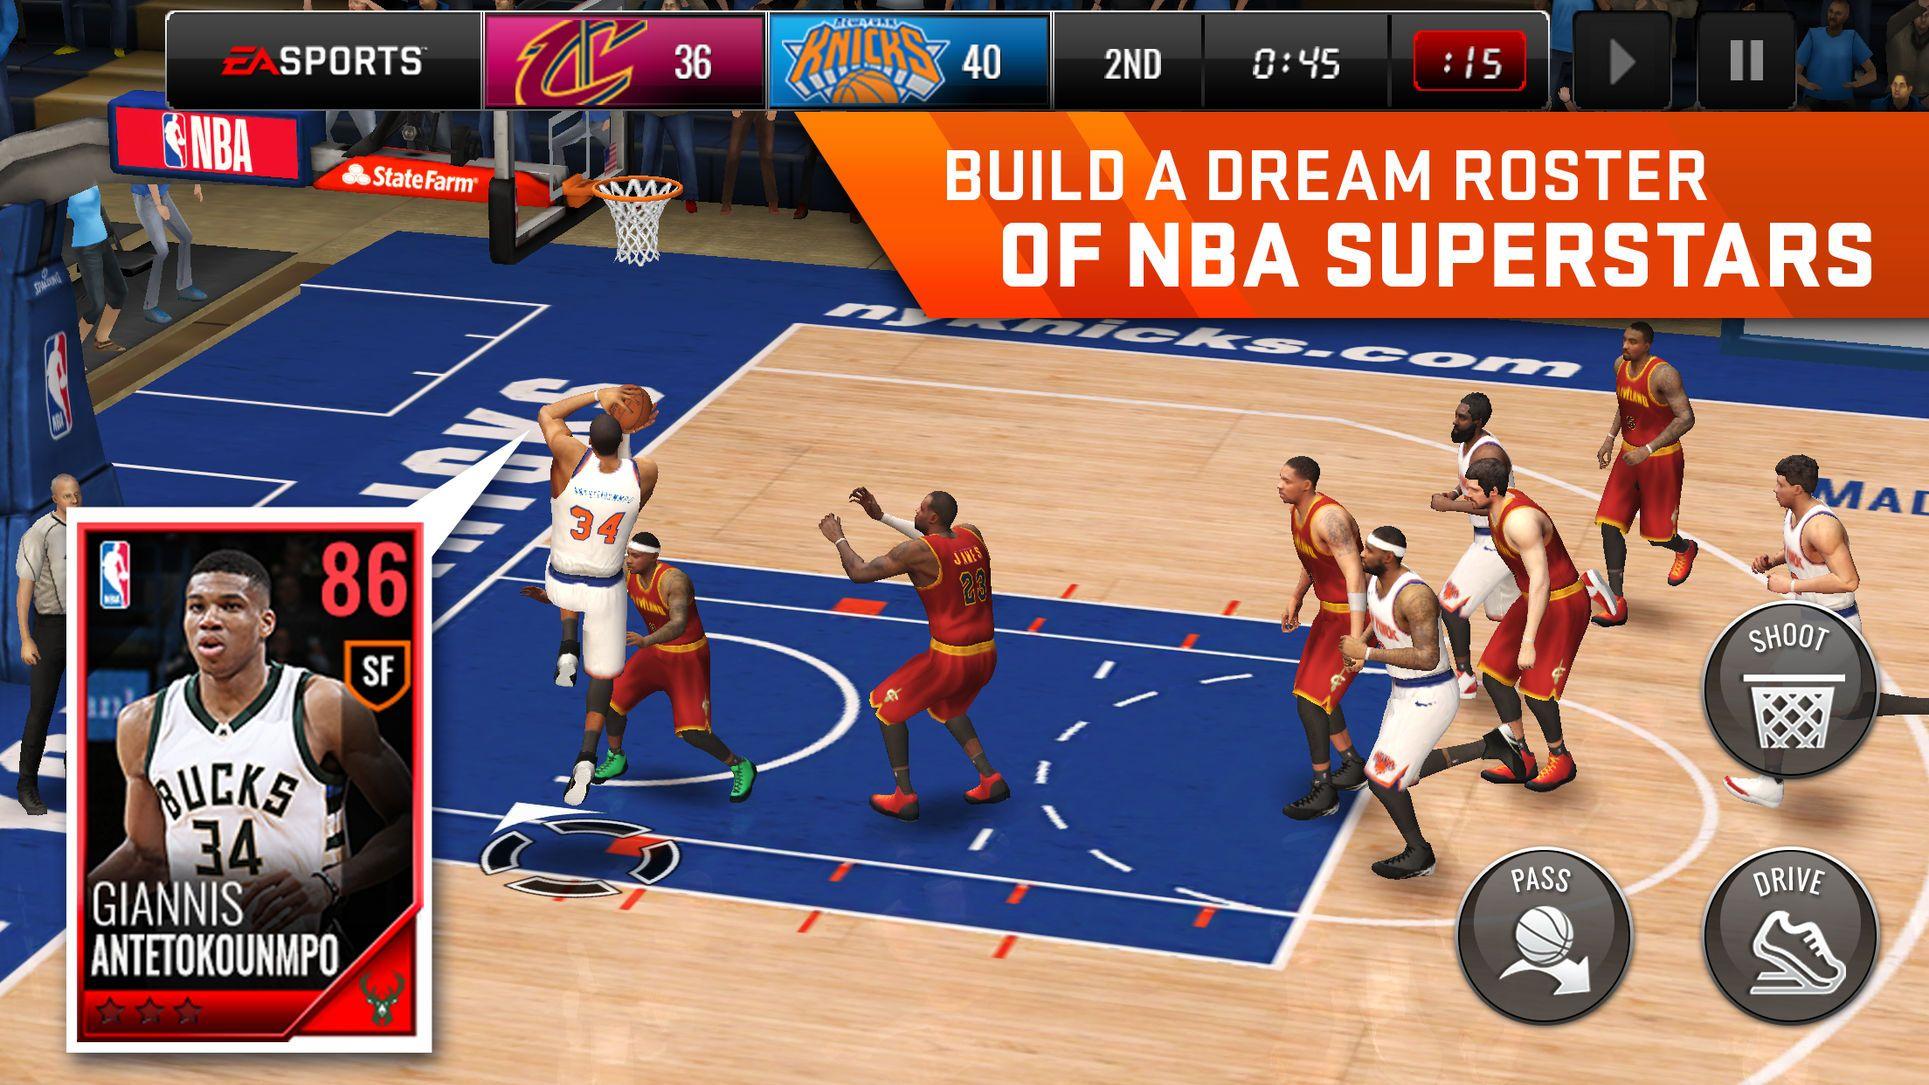 Nba Live Mobile Basketball Games Arts Sports Ios Nba Live Basketball Nba